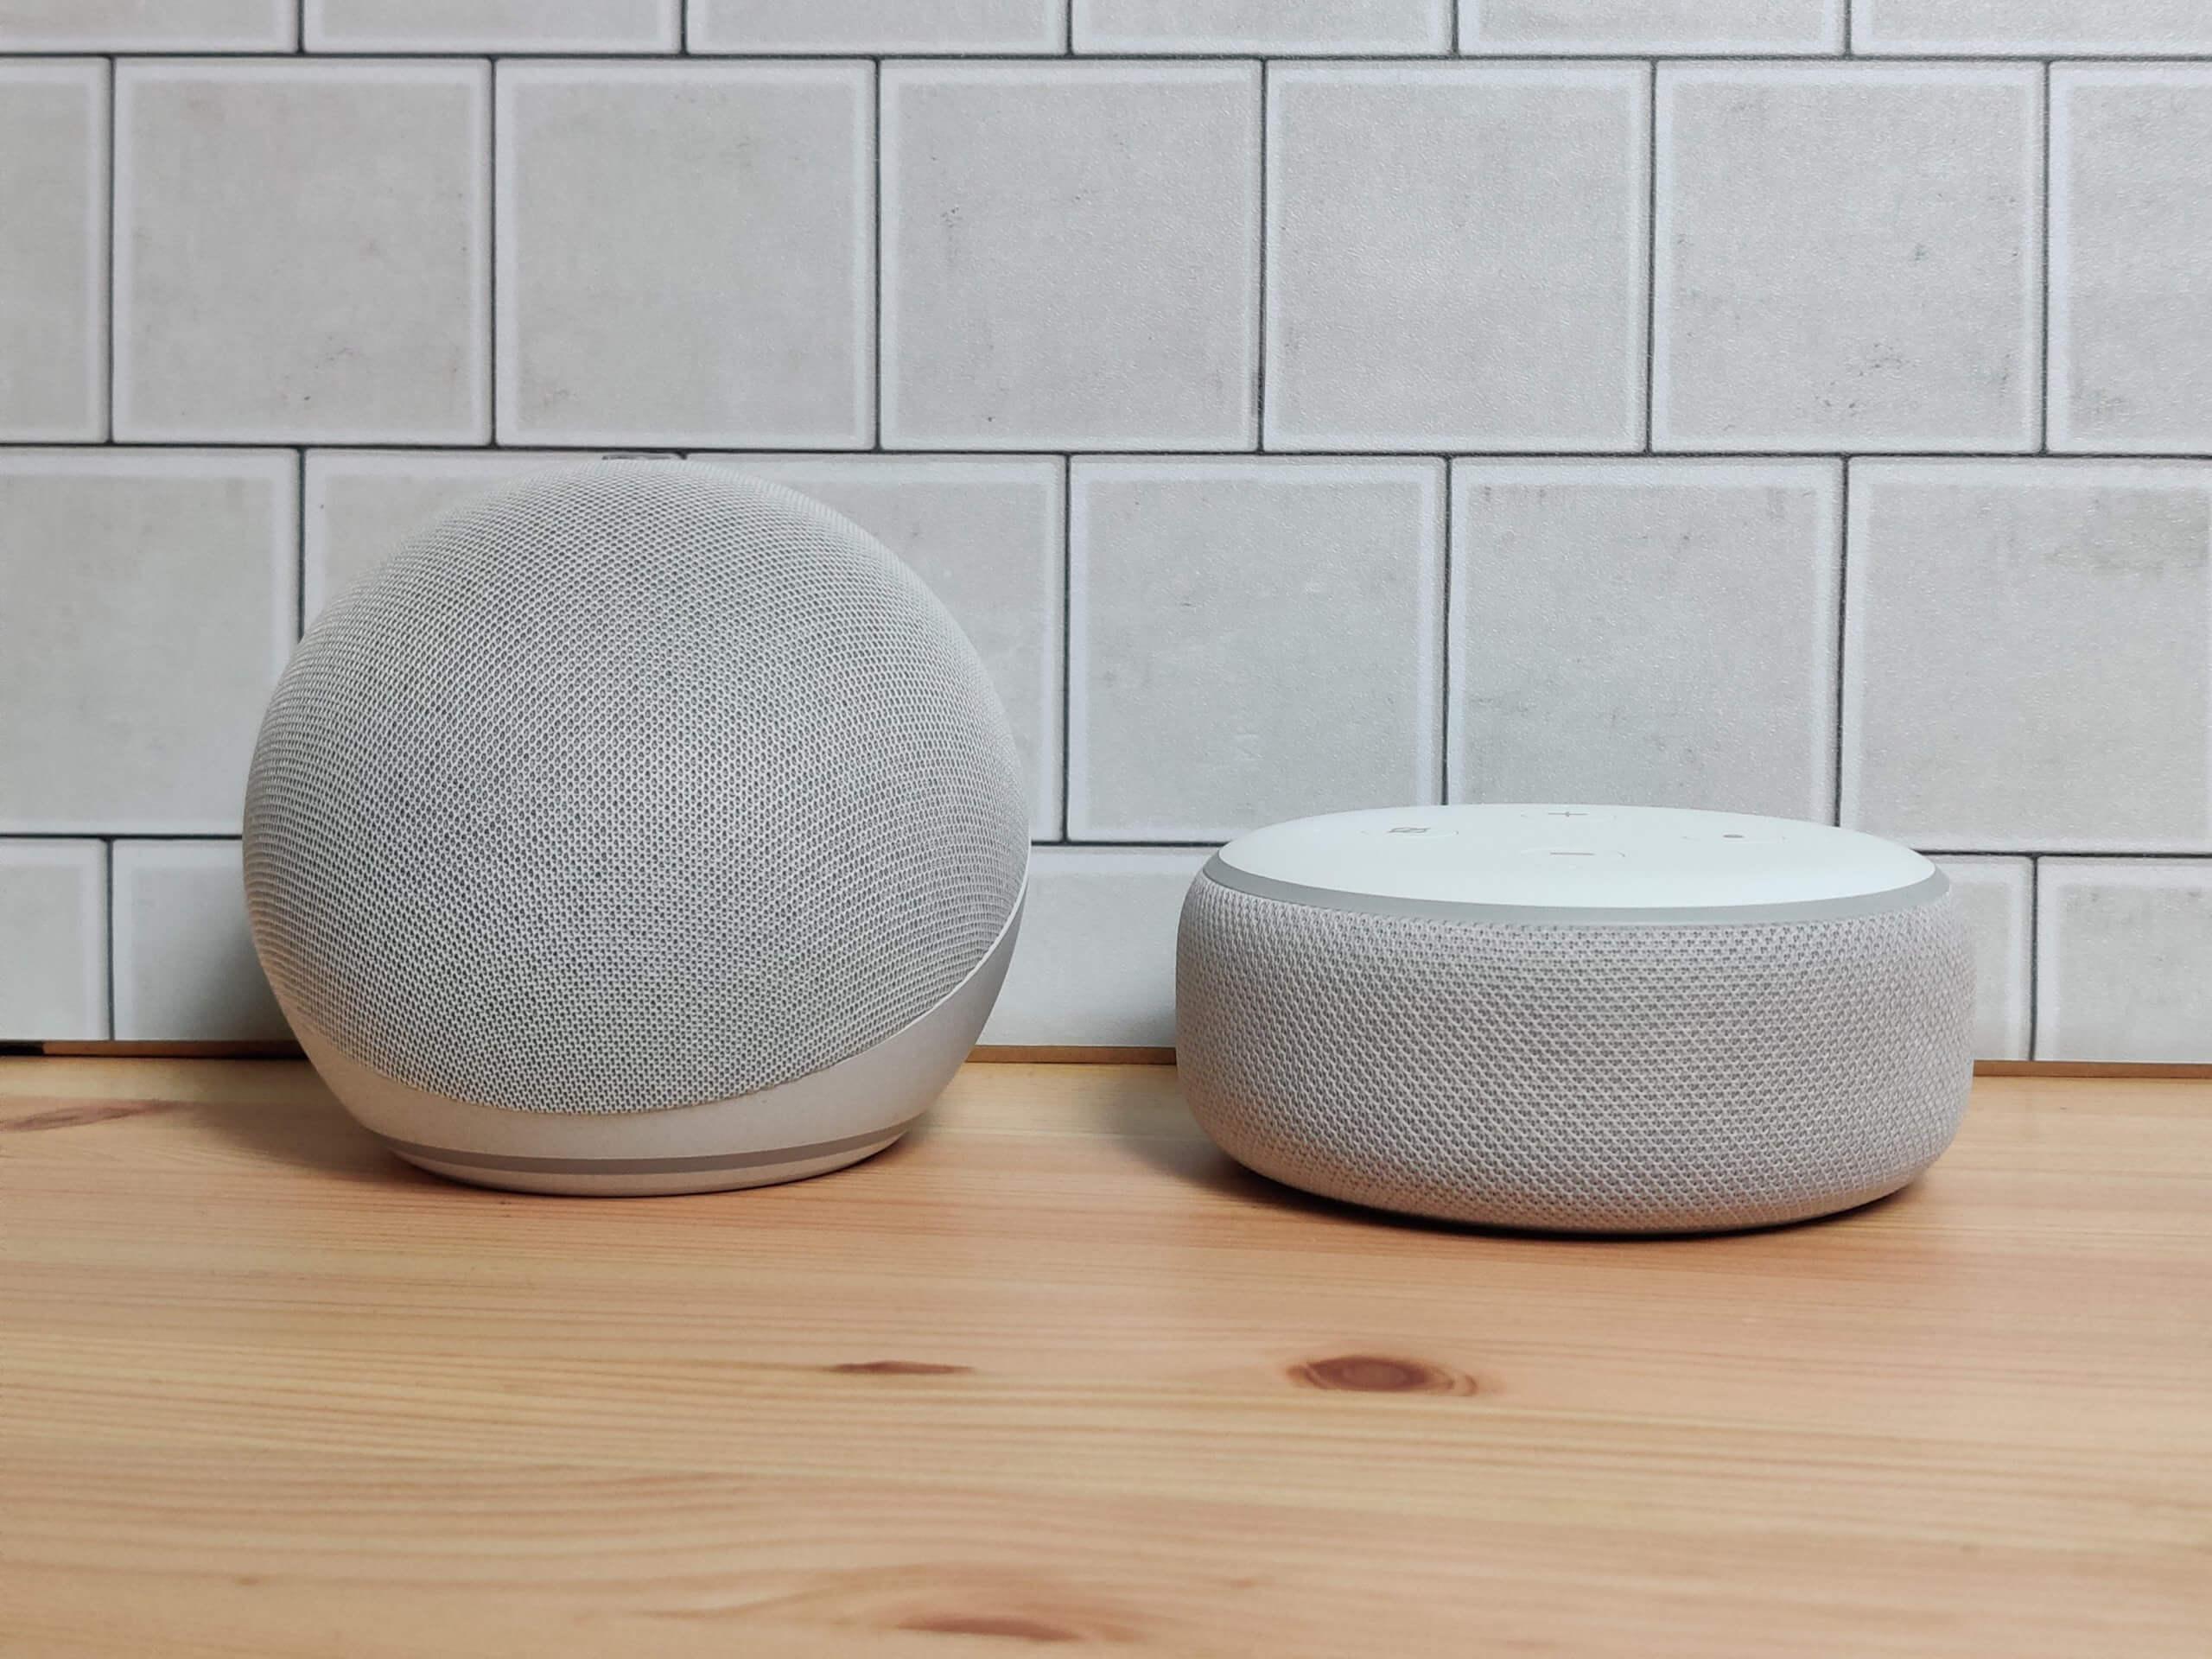 Echo Dot(第4世代)とEcho Dot(第3世代)